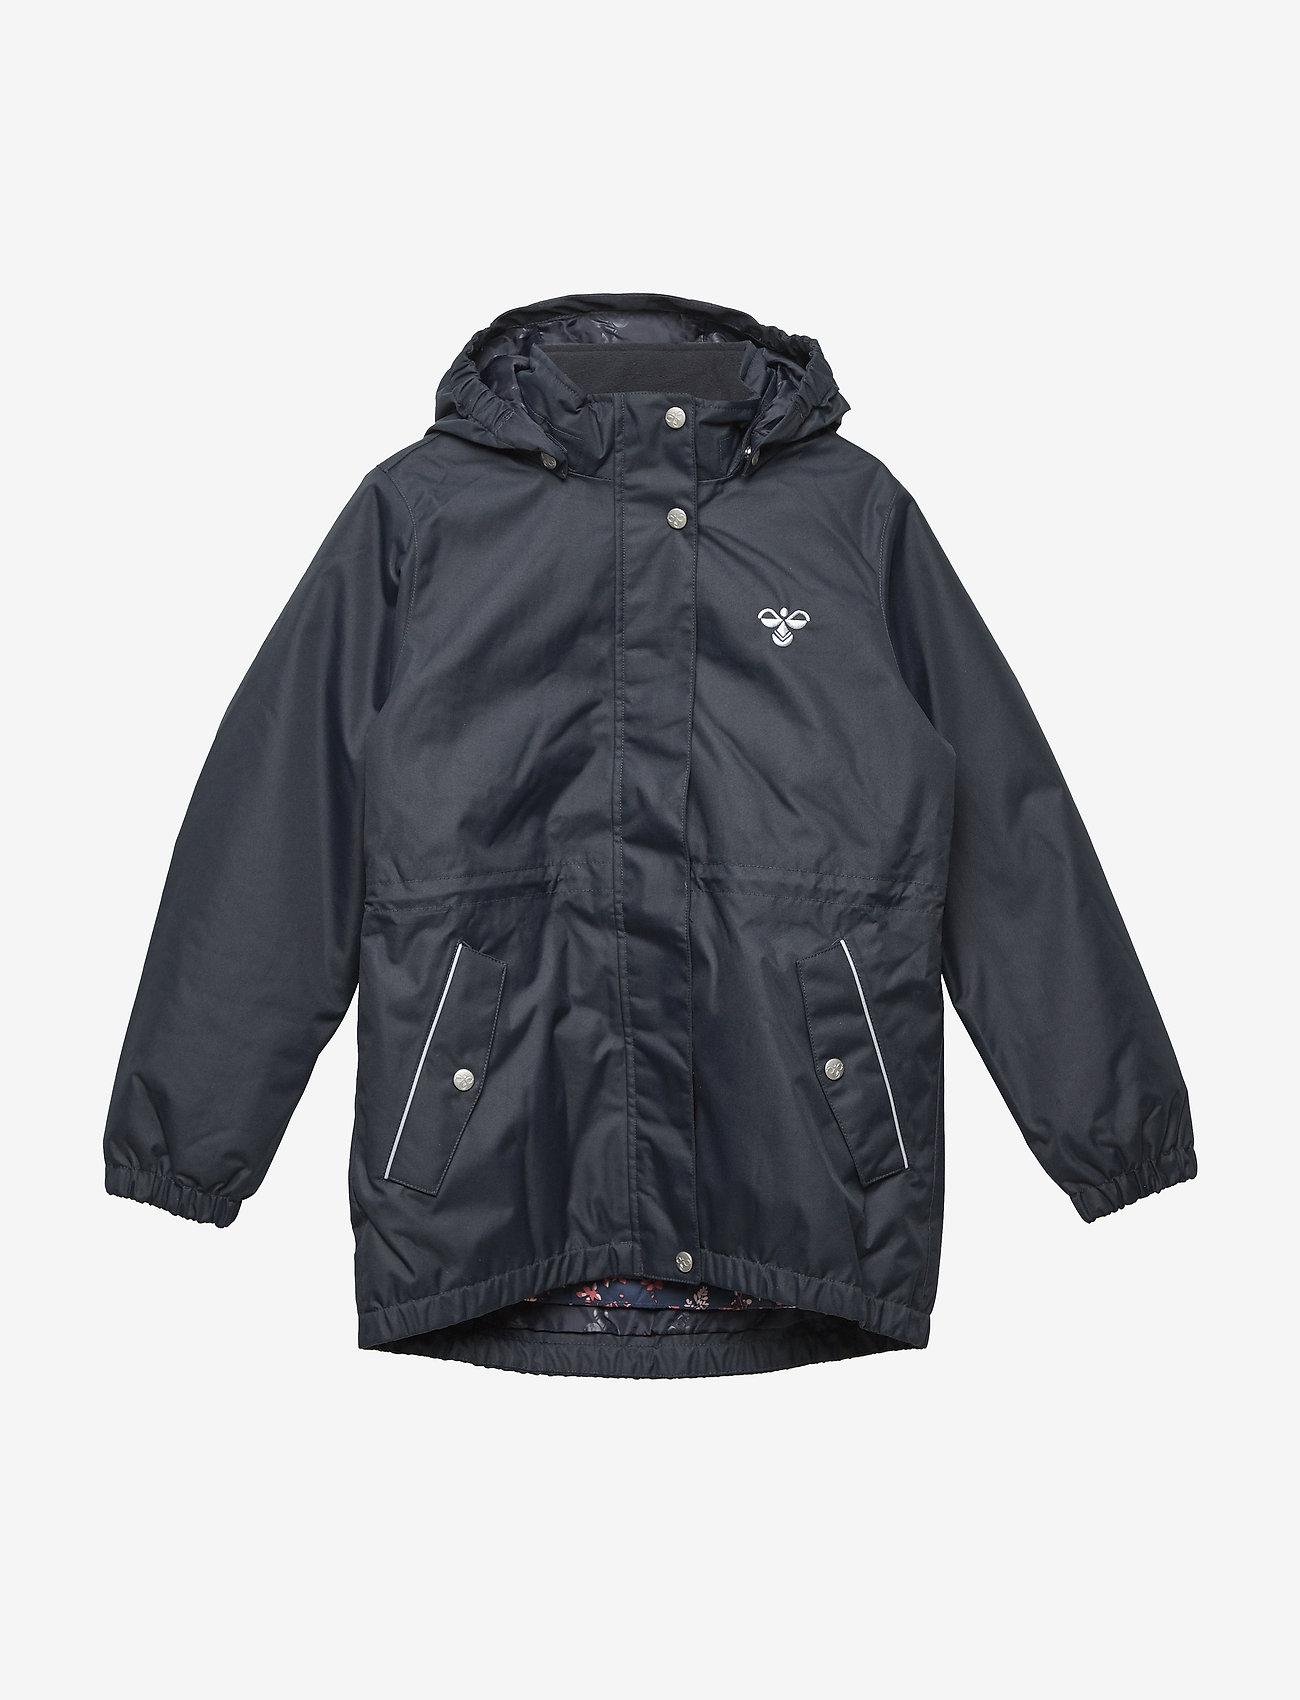 Hummel - HMLDAISY JACKET - insulated jackets - dark navy - 0